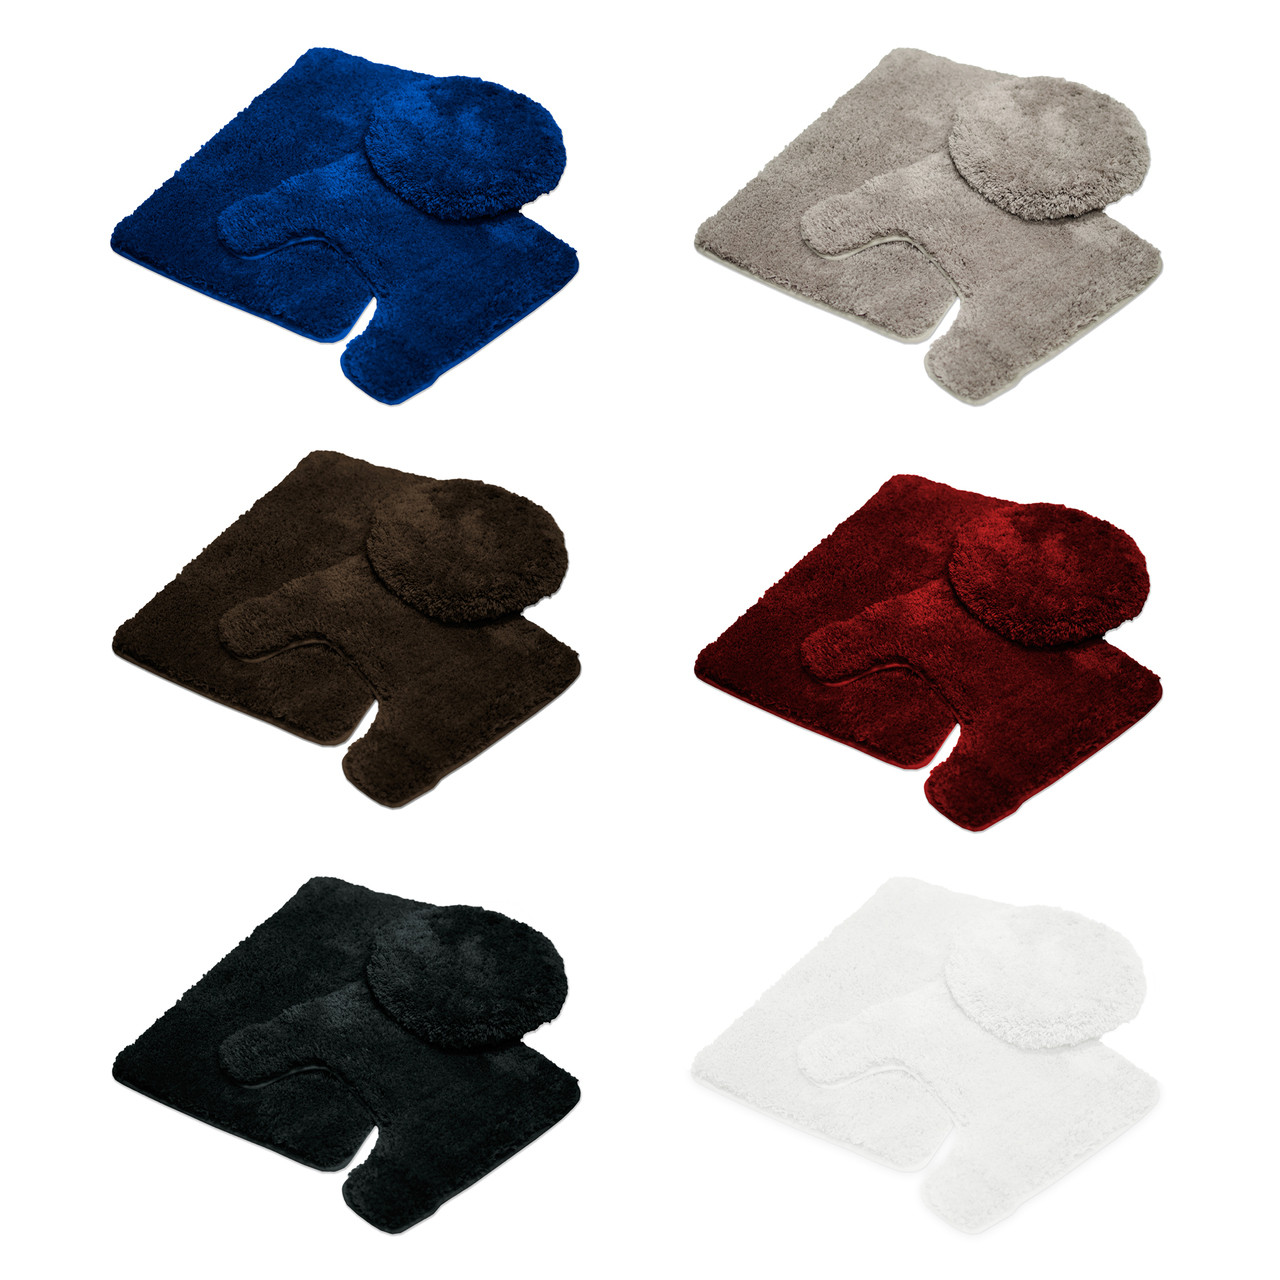 Mary 3 Piece Soft Plush Microfiber Rug Set  Bath Mat  Contour Rug  Lid. Mary 3 Piece Soft Plush Microfiber Rug Set  Bath Mat  Contour Rug